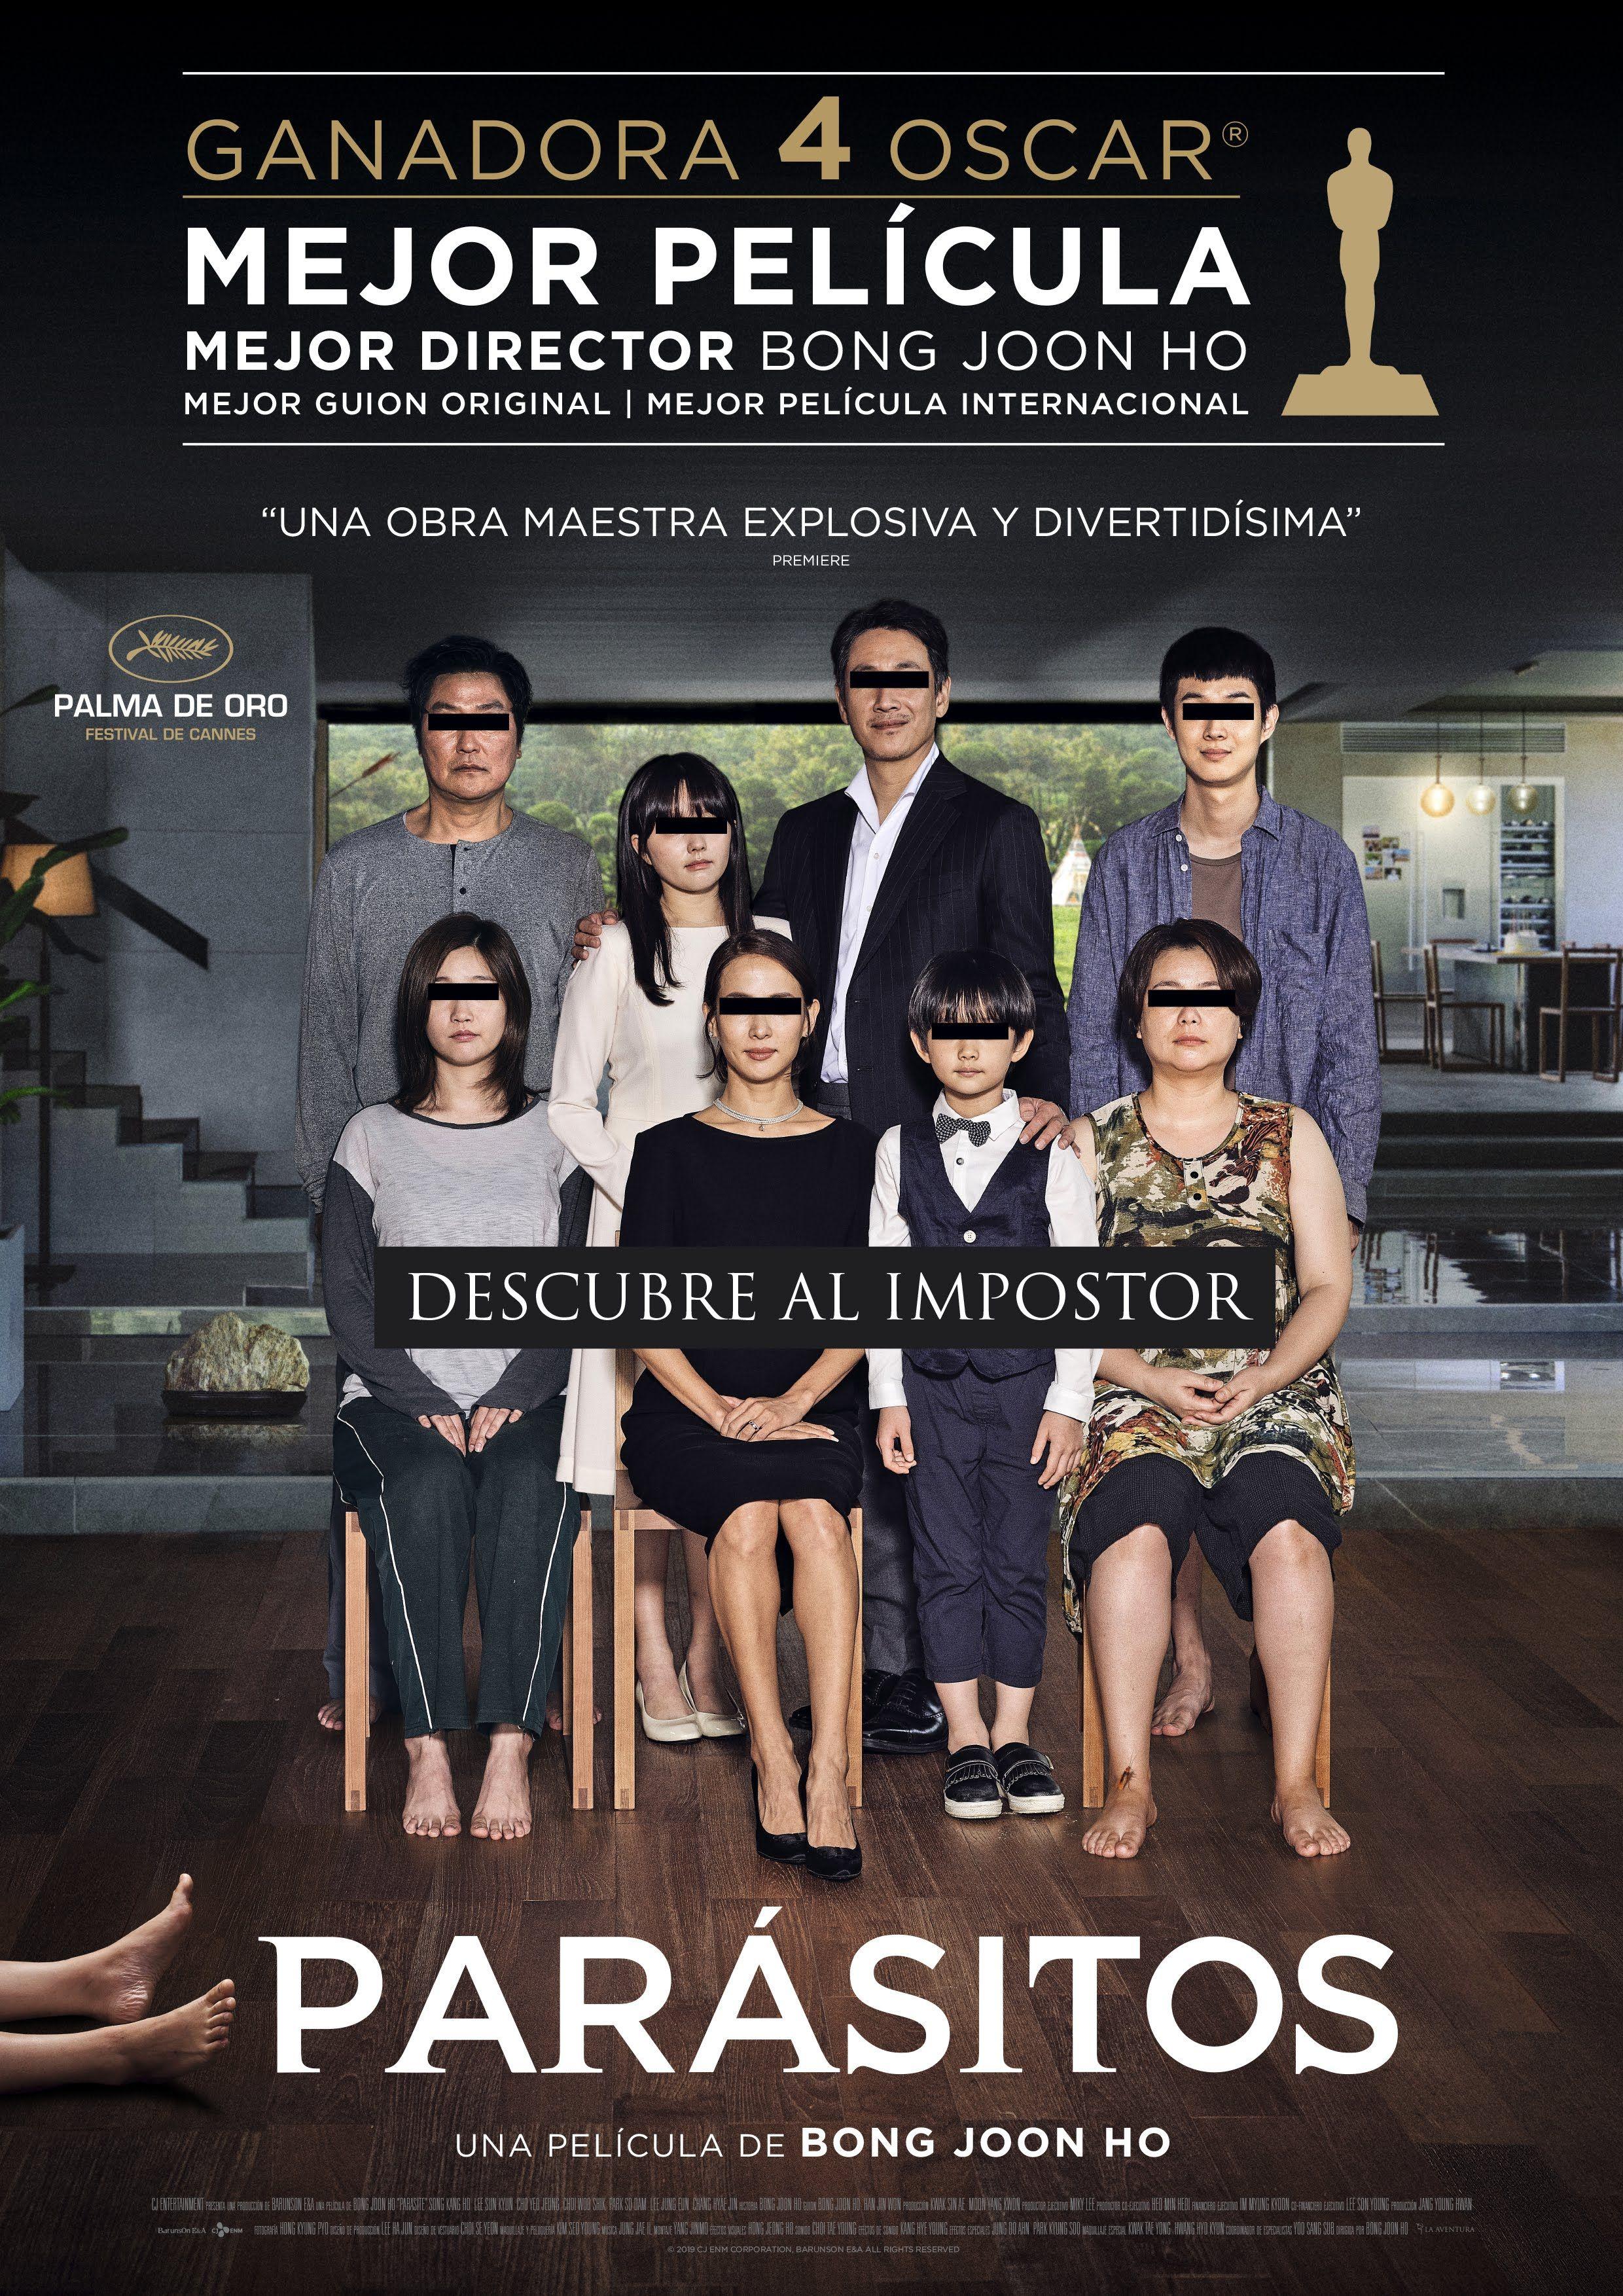 Parasitos 2020 韓国 映画 映画 ポスター 映画